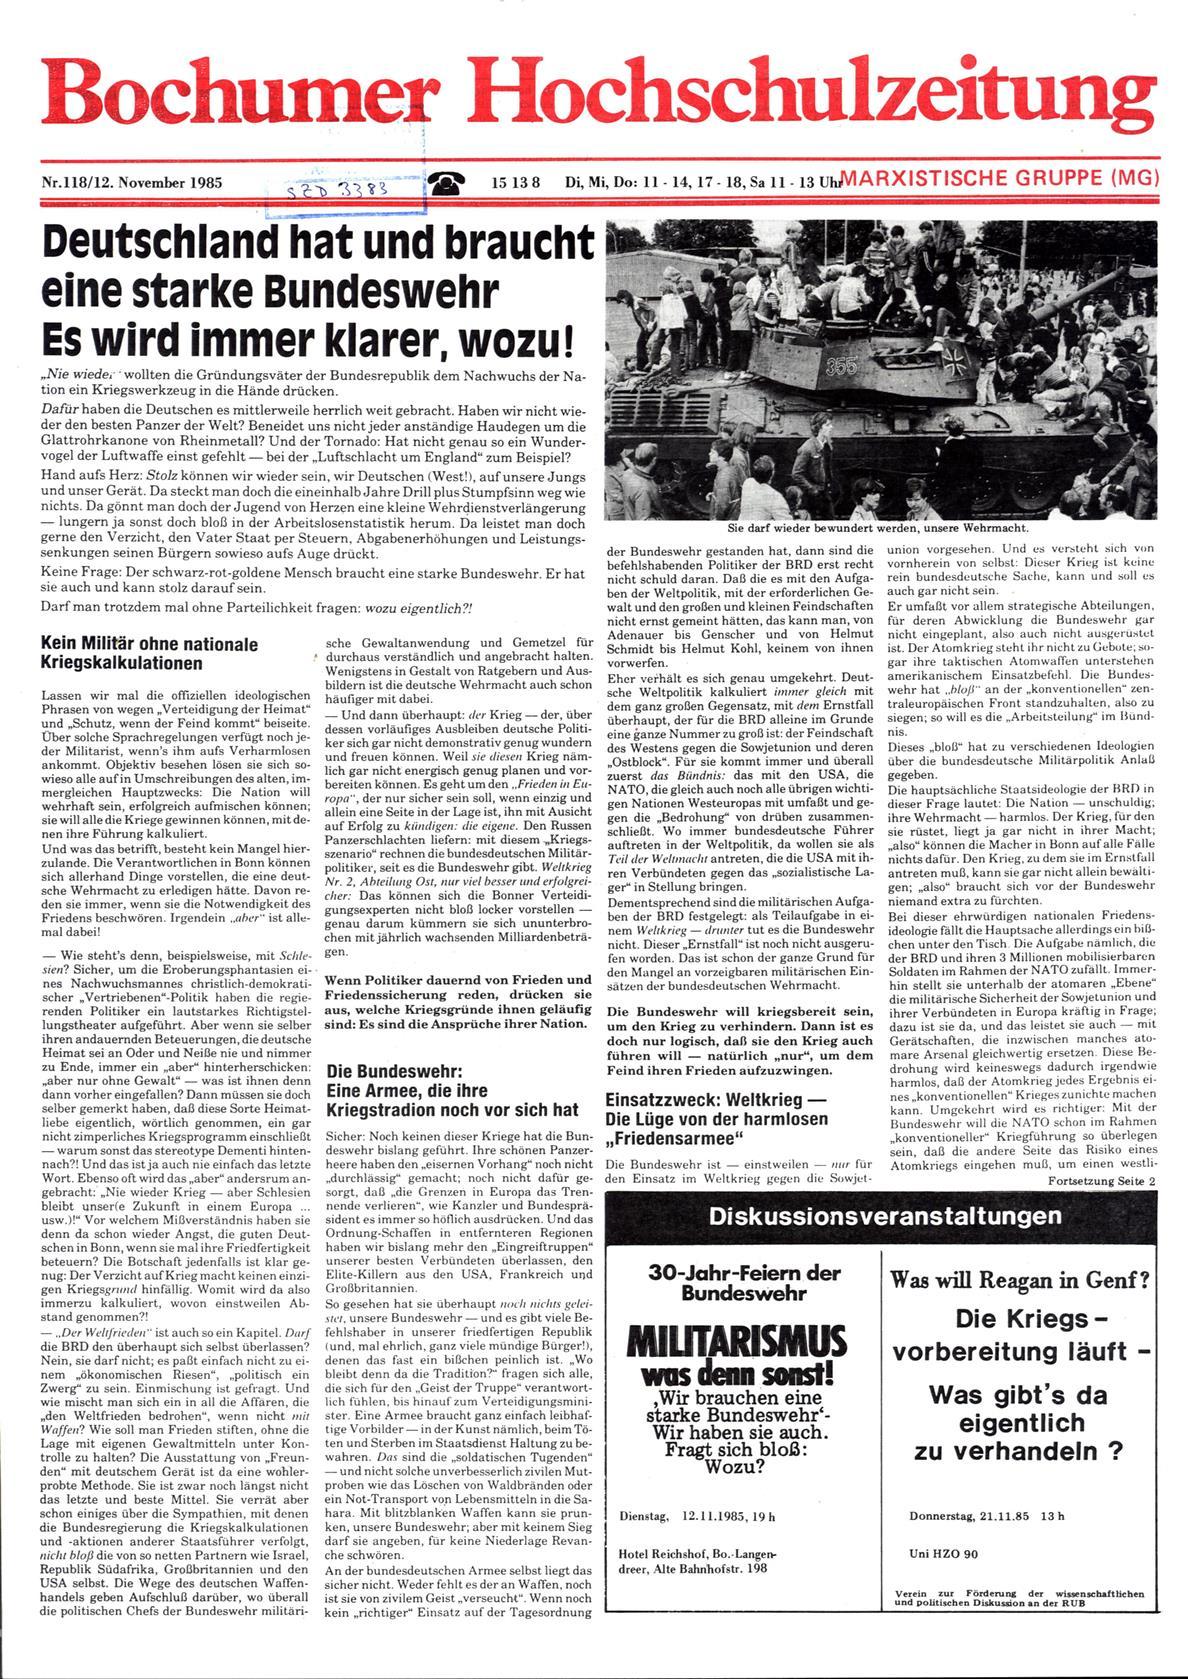 Bochum_BHZ_19851112_118_001